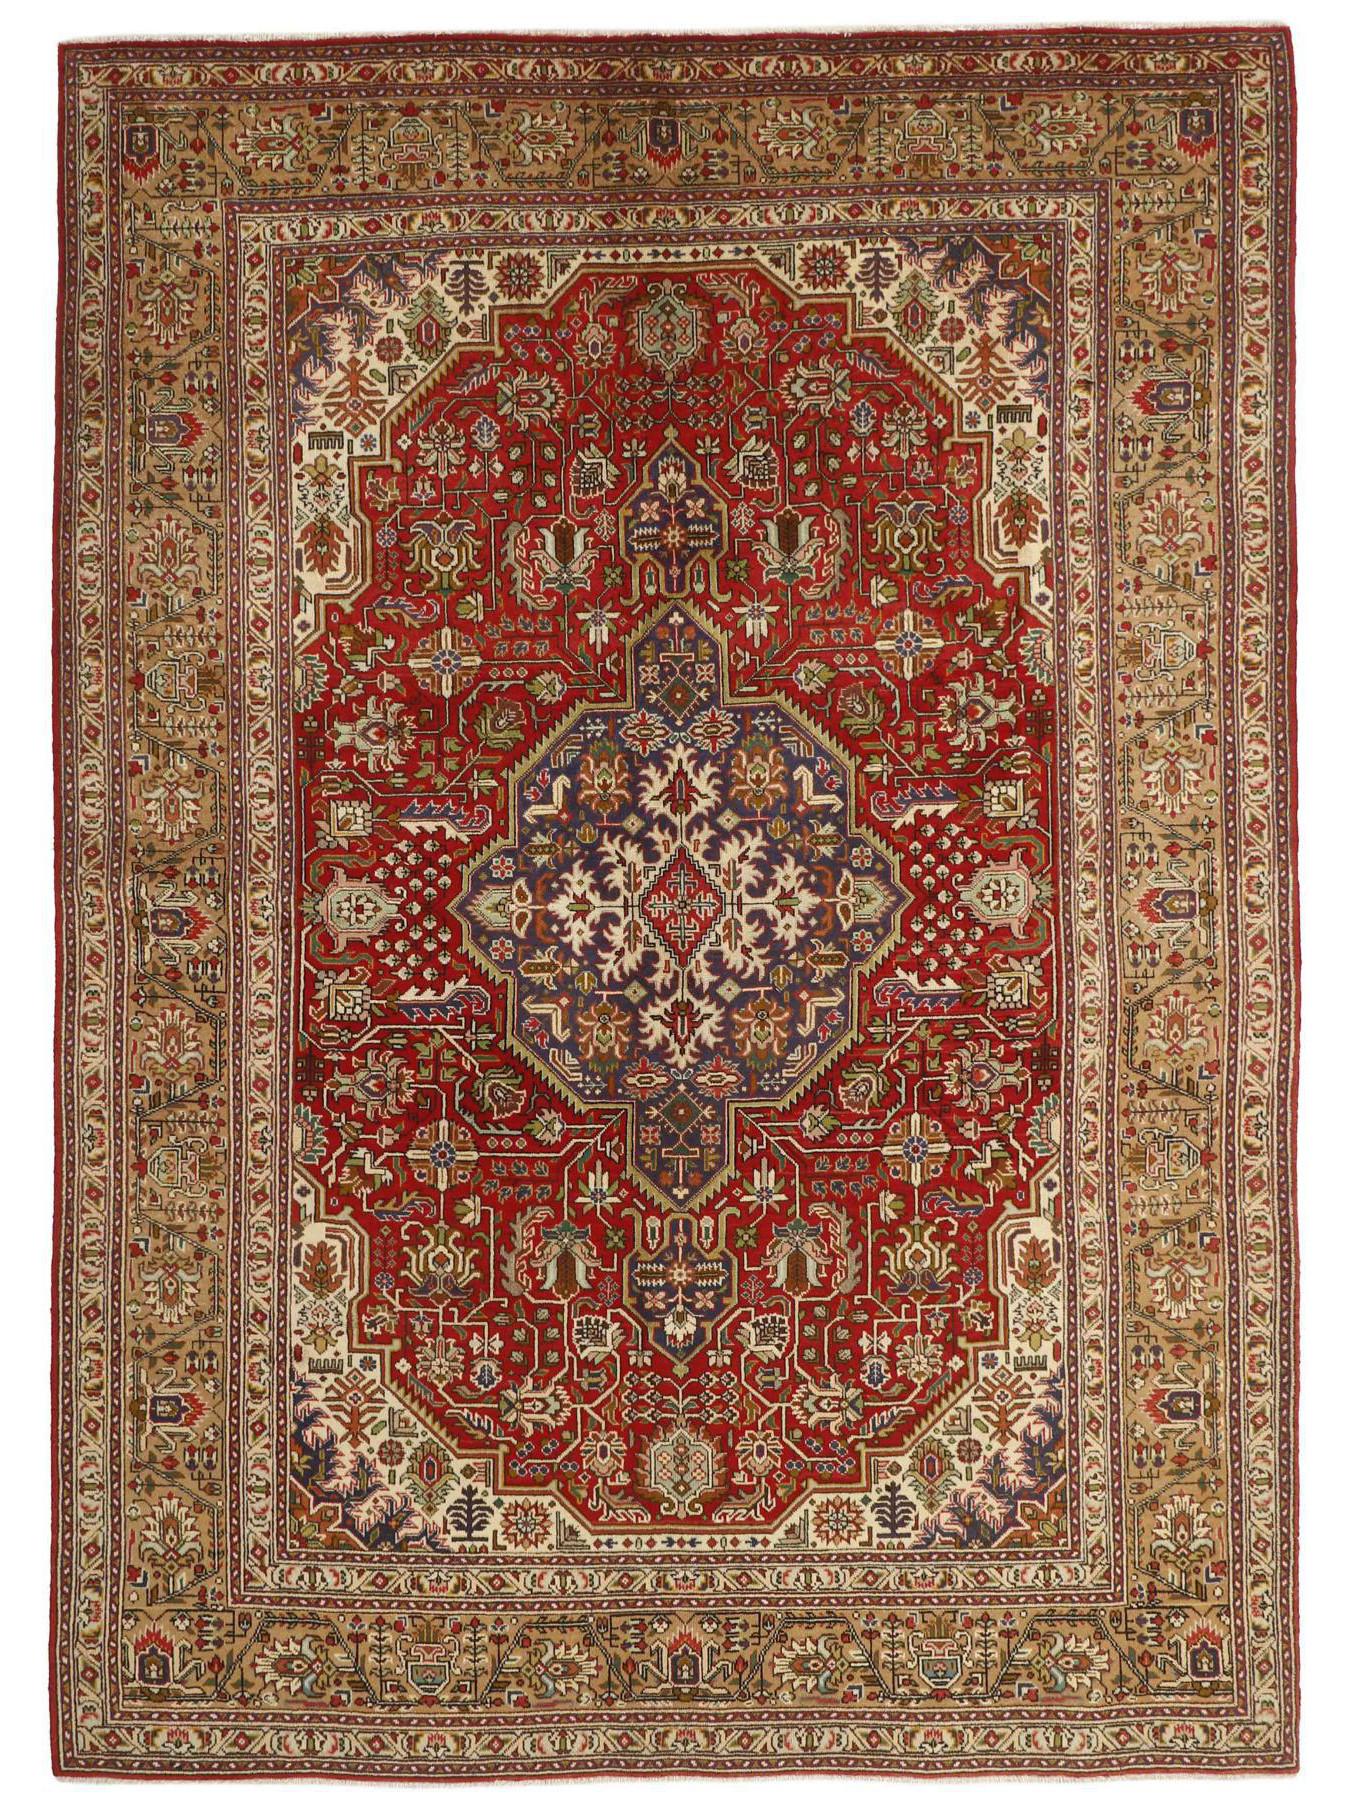 Tapis persans - Tabriz